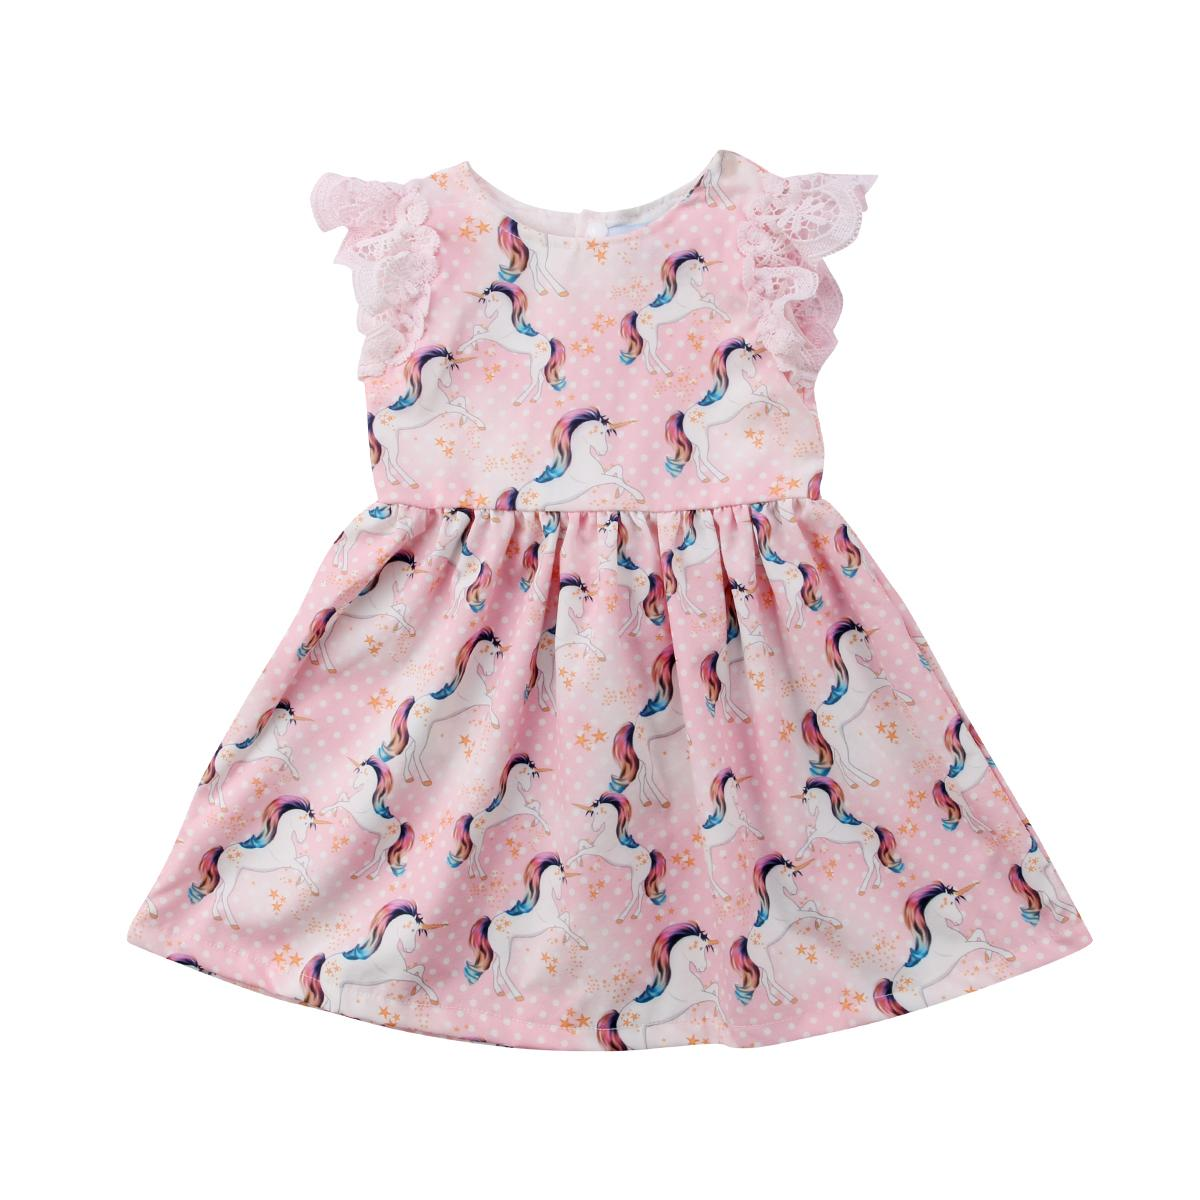 Лето Сладкий Симпатичные принцесса Dot печати Pink Малыши Kid ребёнки Lace Мультфильм Unicorn партии Pageant Туту платье сарафан Одежда